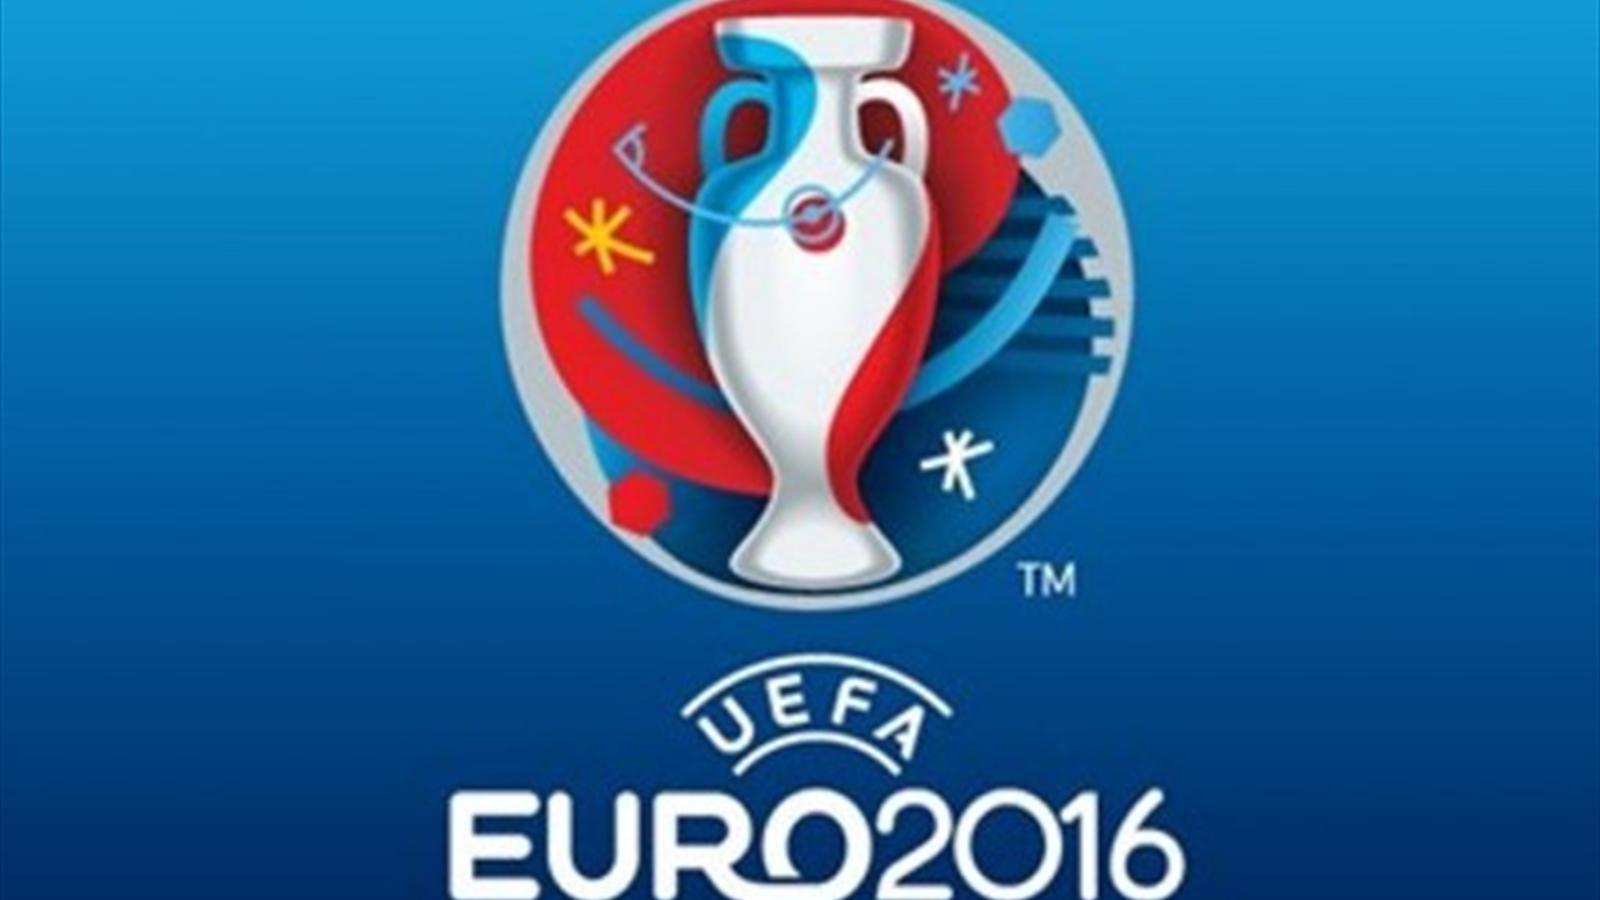 le logo de l 39 euro 2016 d voil par l 39 uefa et michel platini euro 2016 football eurosport. Black Bedroom Furniture Sets. Home Design Ideas